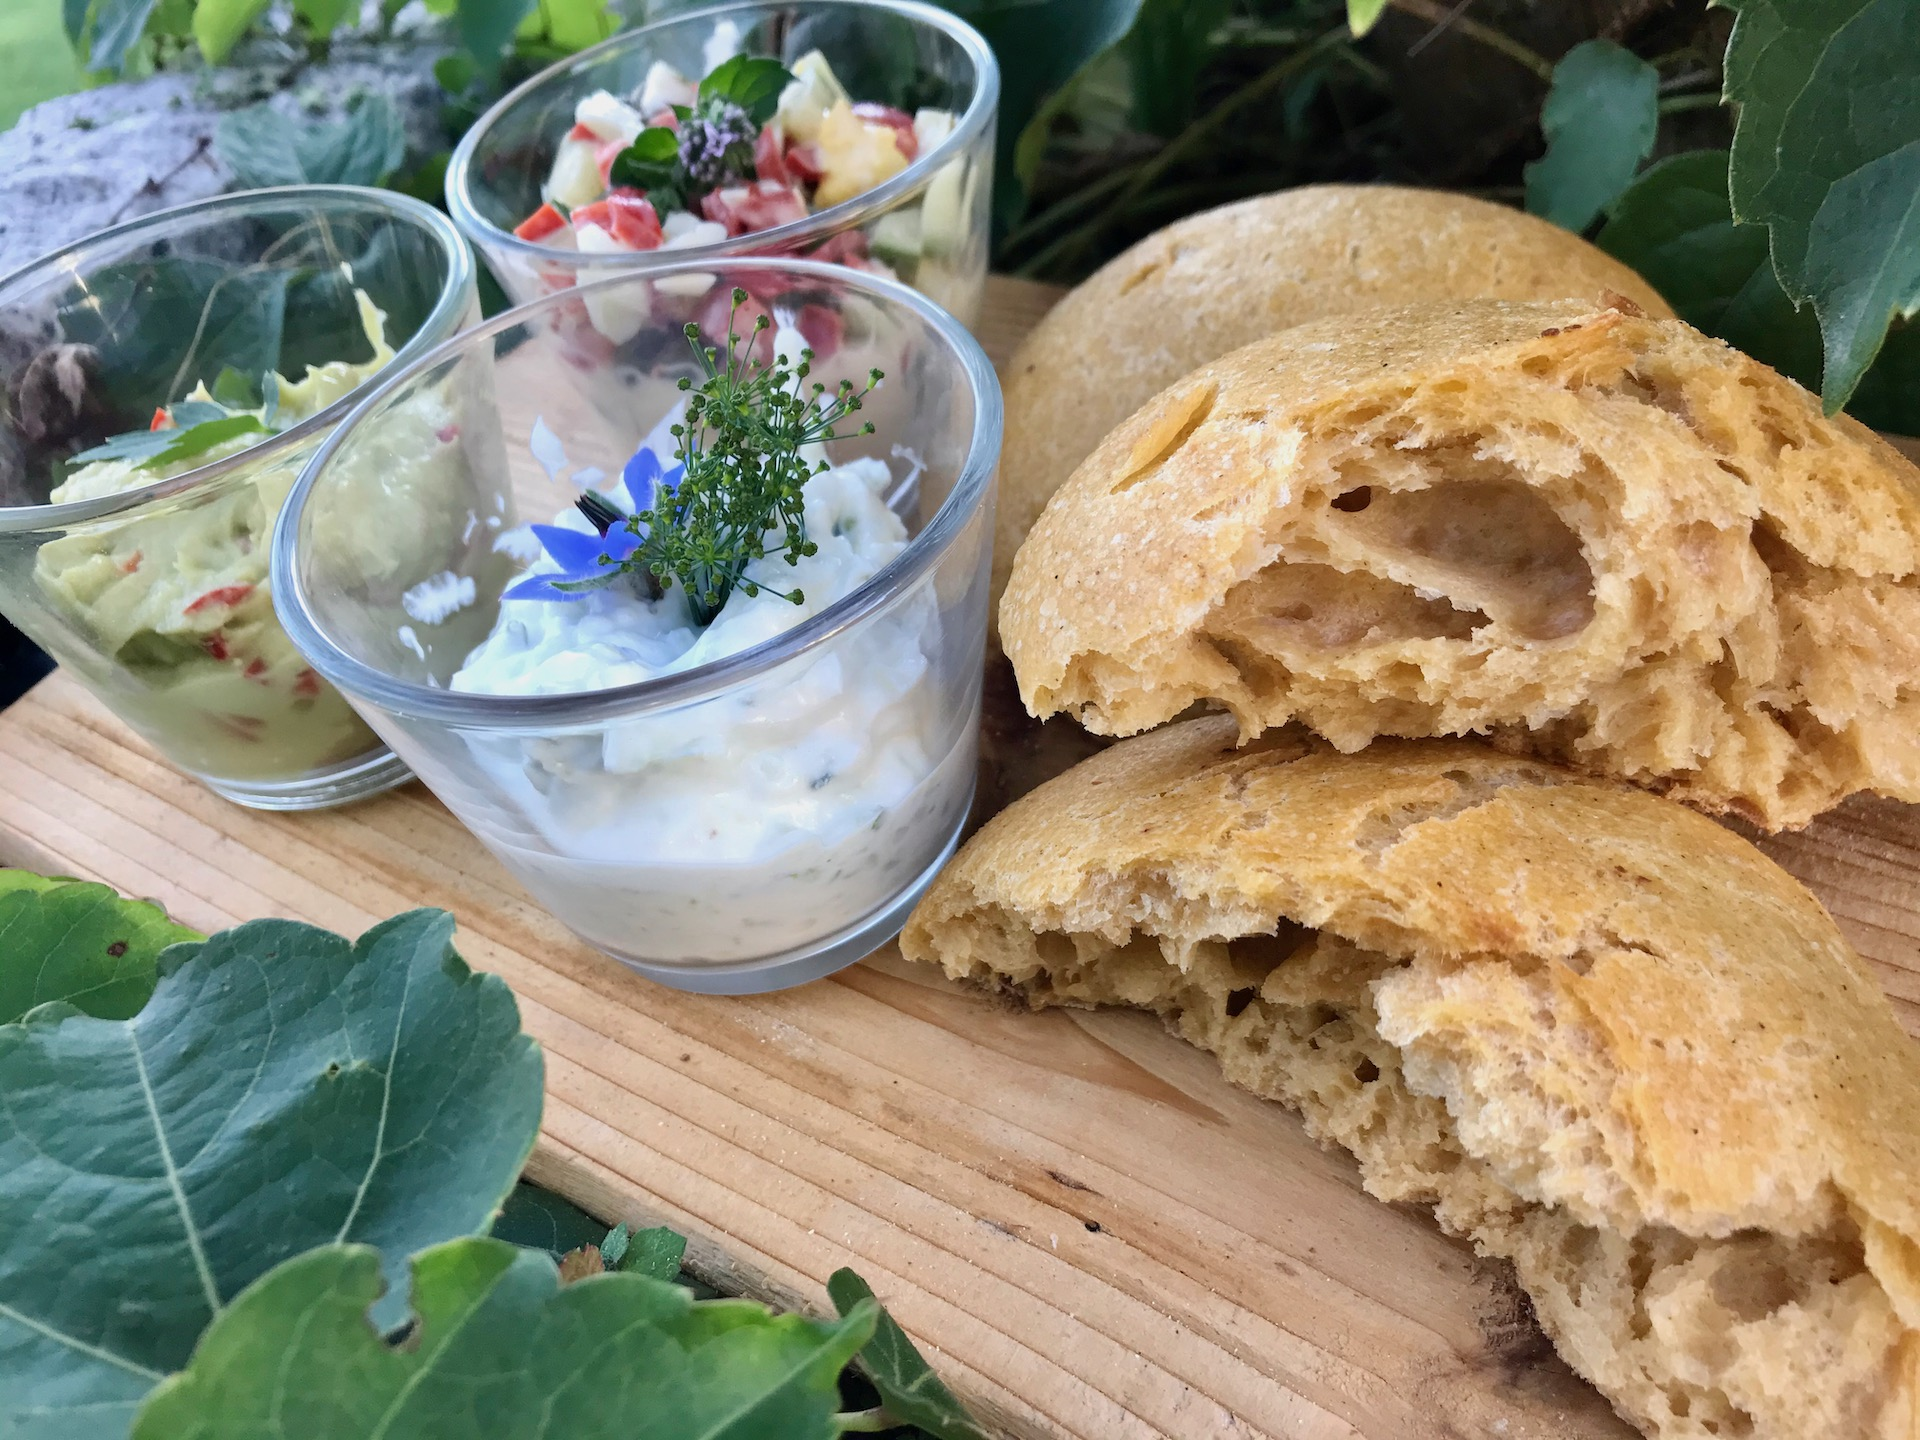 Bolo di Caco, Süßkartoffelbrötchen aus Madeira